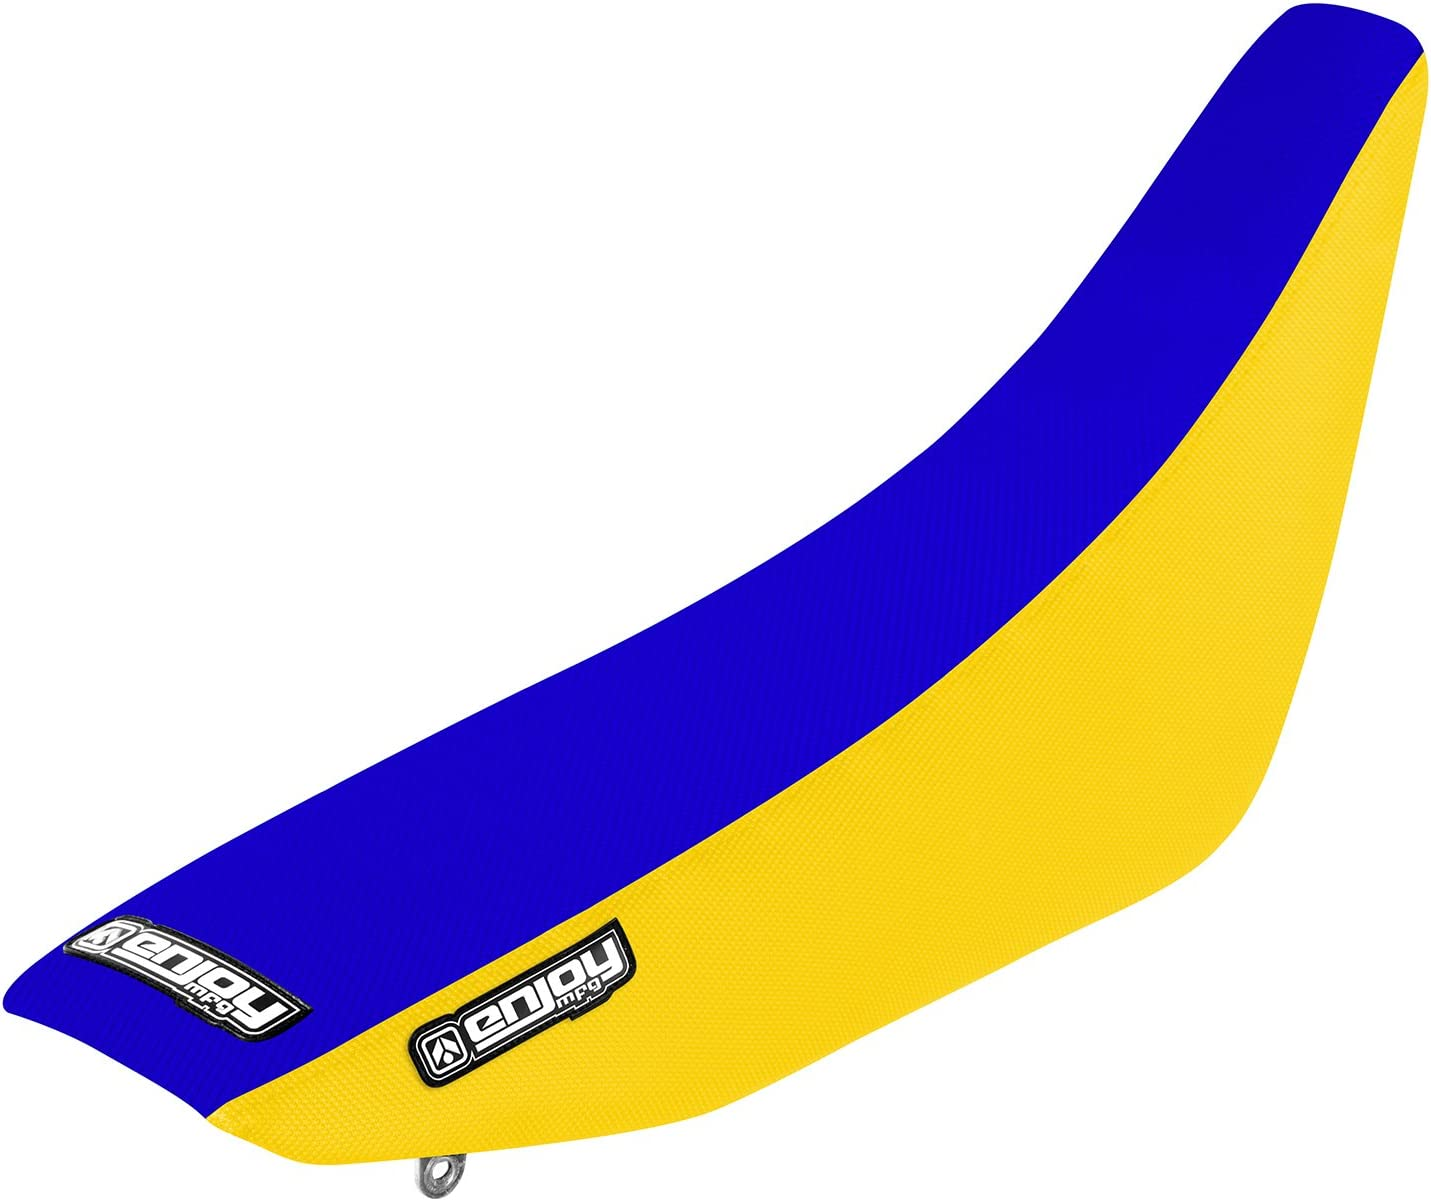 Blue Top Full Gripper Seat Cover Enjoy MFG 2002-2012 Suzuki RM 85 Yellow Sides